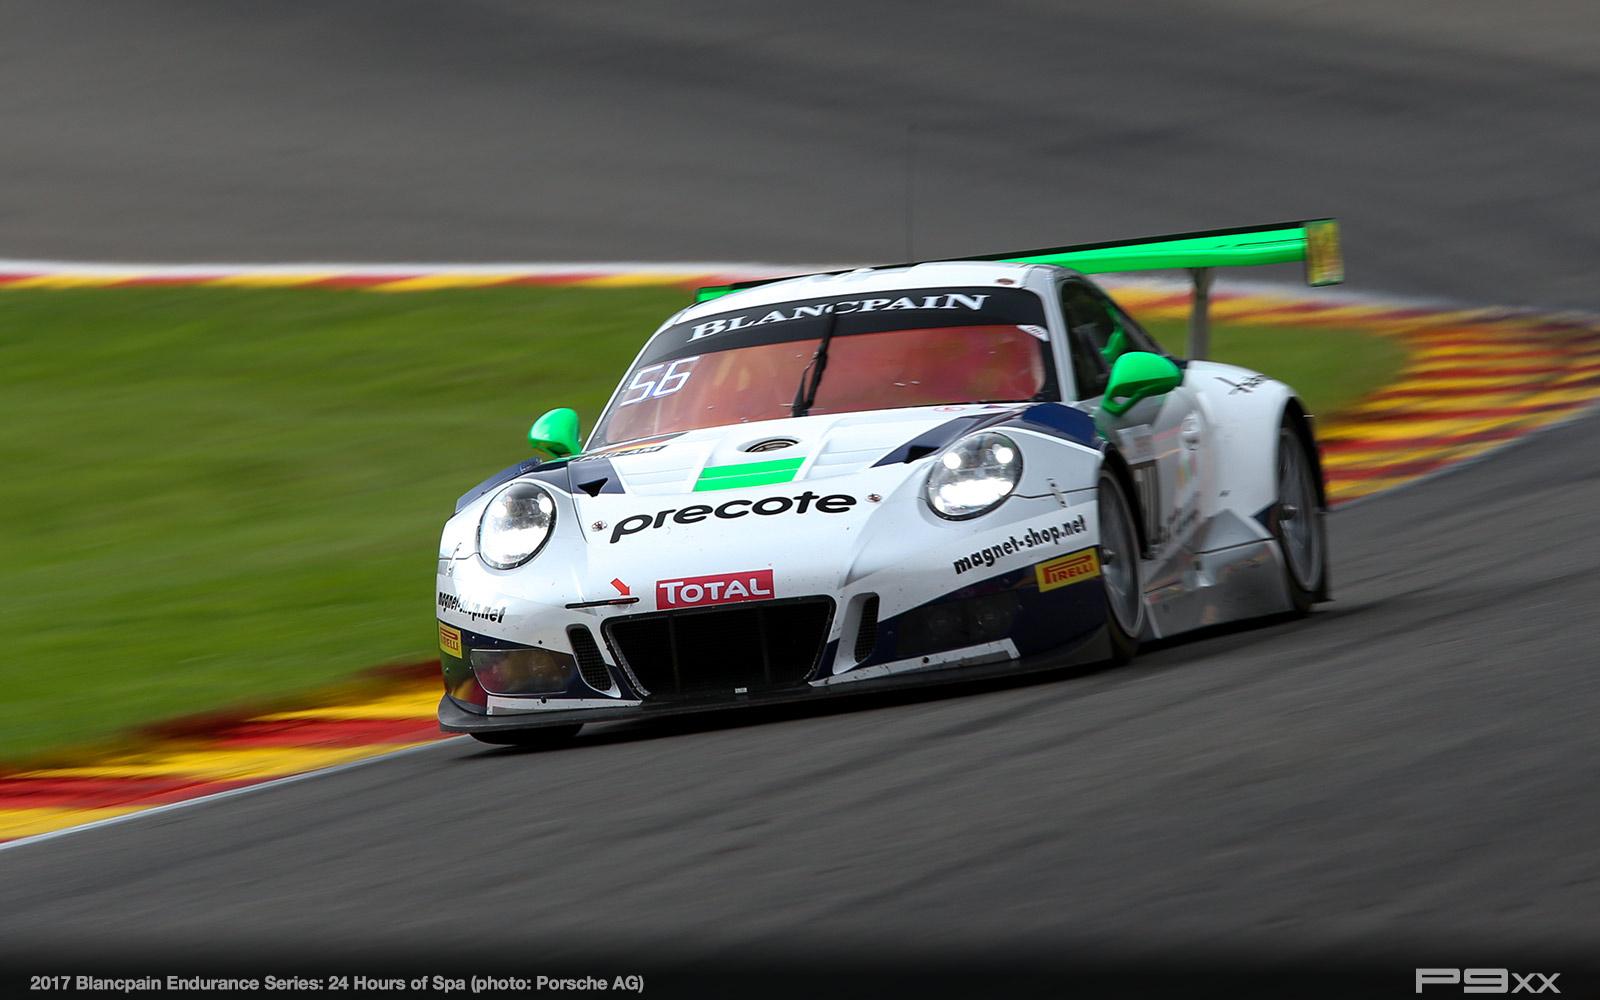 2017-24-Hours-of-Spa-Porsche-310